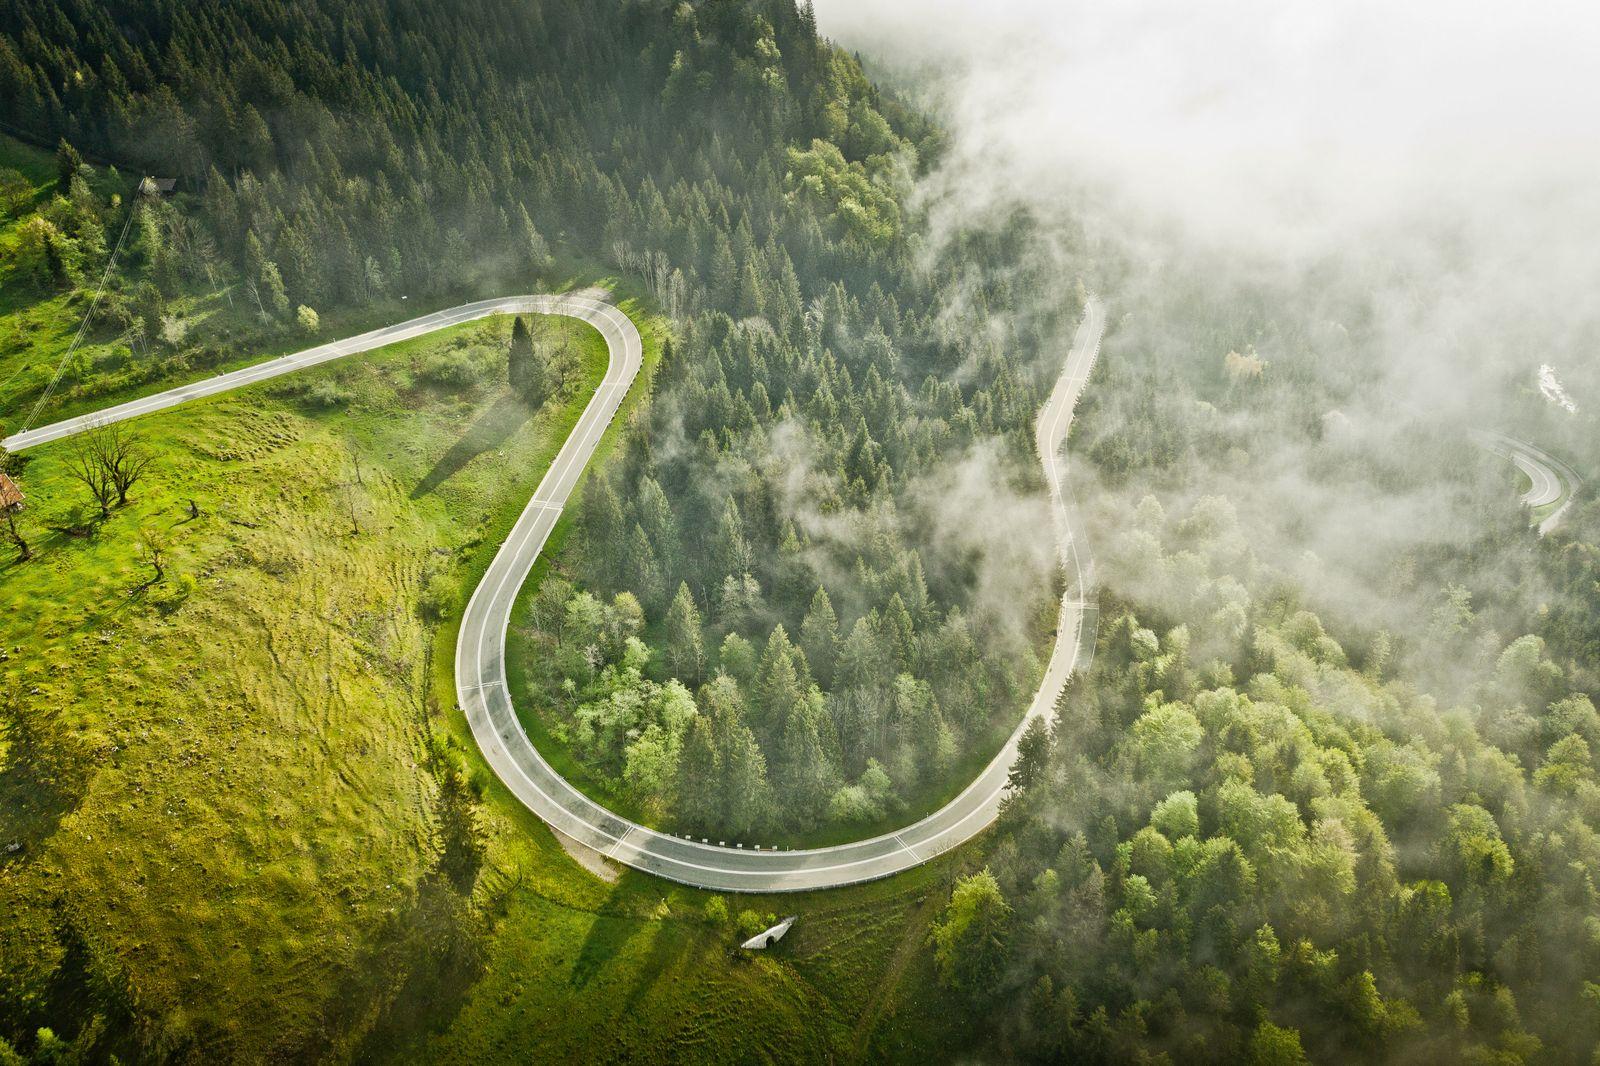 BUCHCOVER / Curves / Delius Klasing Verlag / Luftbild Kurve